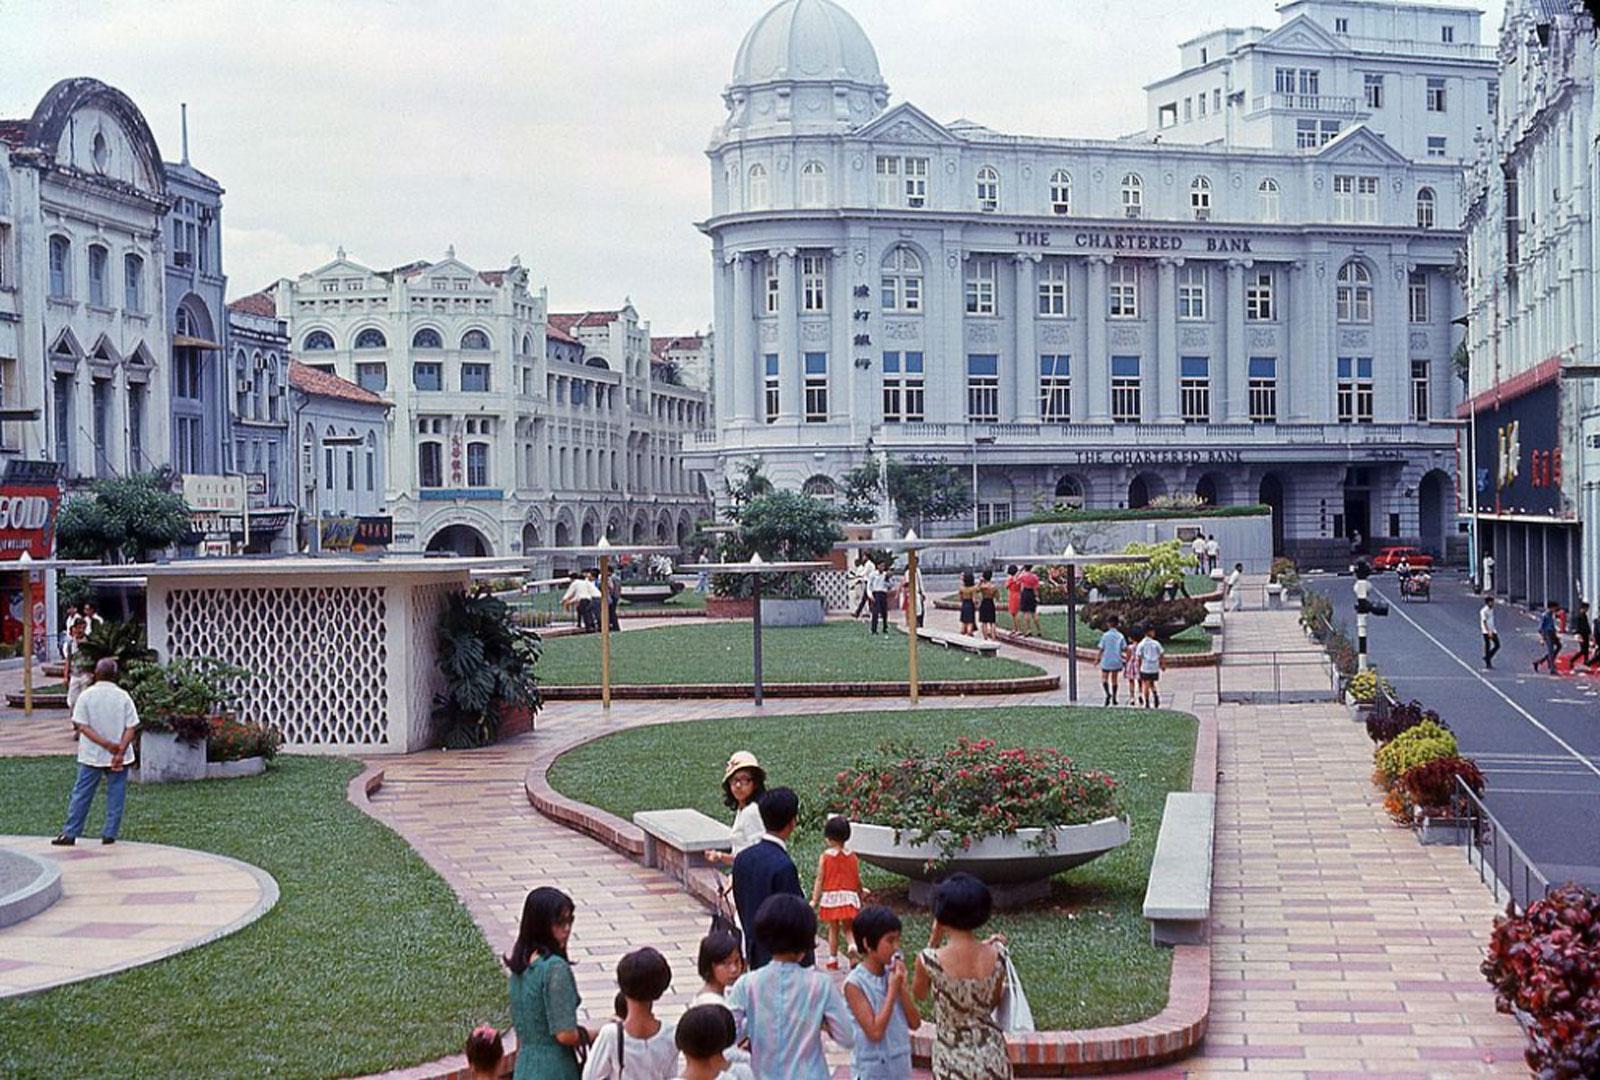 [Photos] Travel through time to street scenes in 1960s Singapore